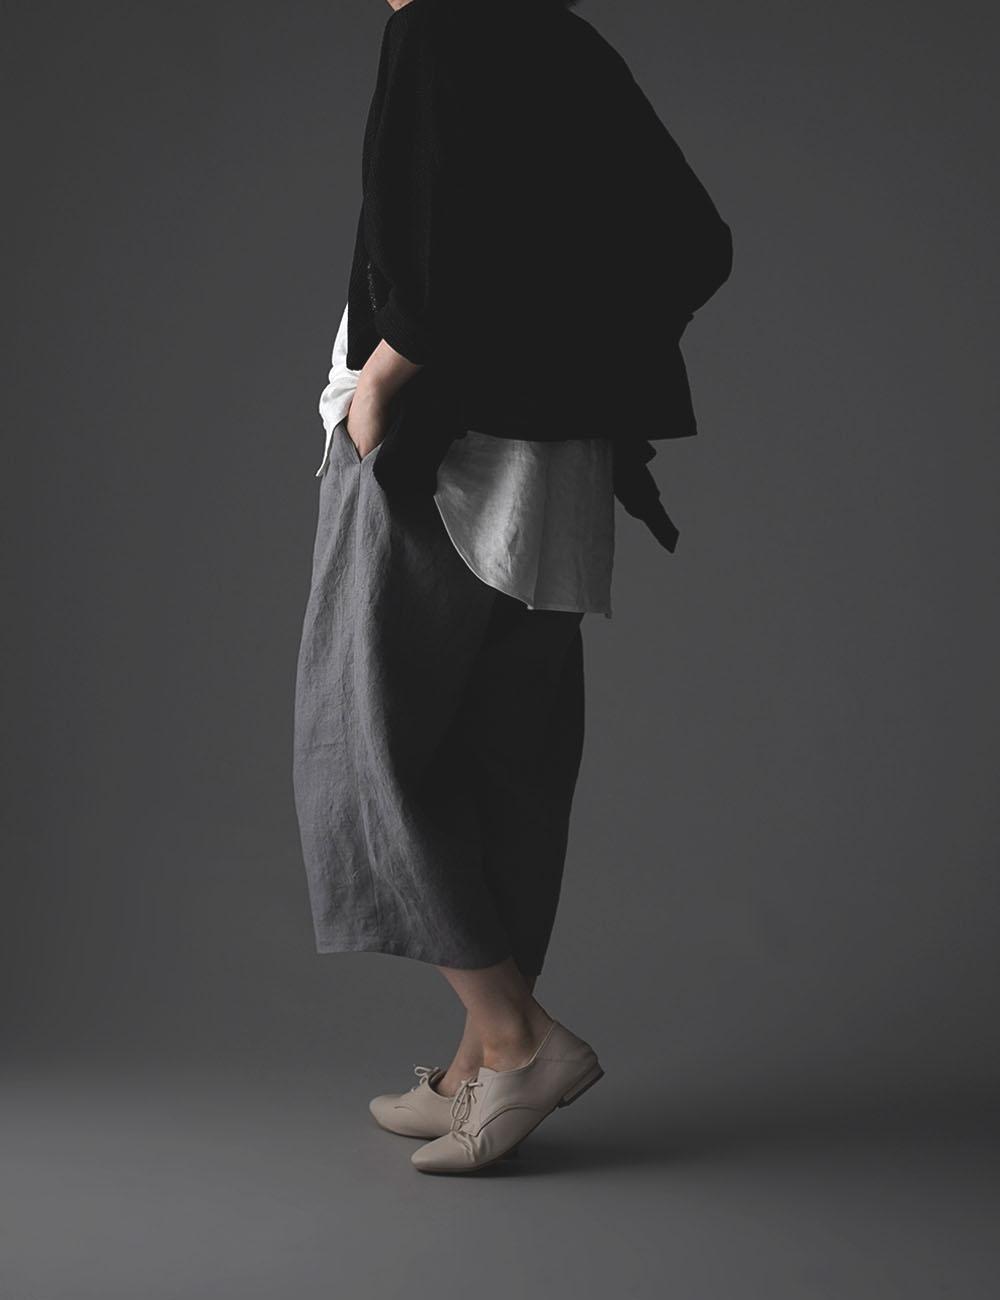 【wafu】 cropped Linen pants 男女兼用 クロップド丈 リネンパンツ 先染め 中厚地 /スチール・グレイ b018g-stg2